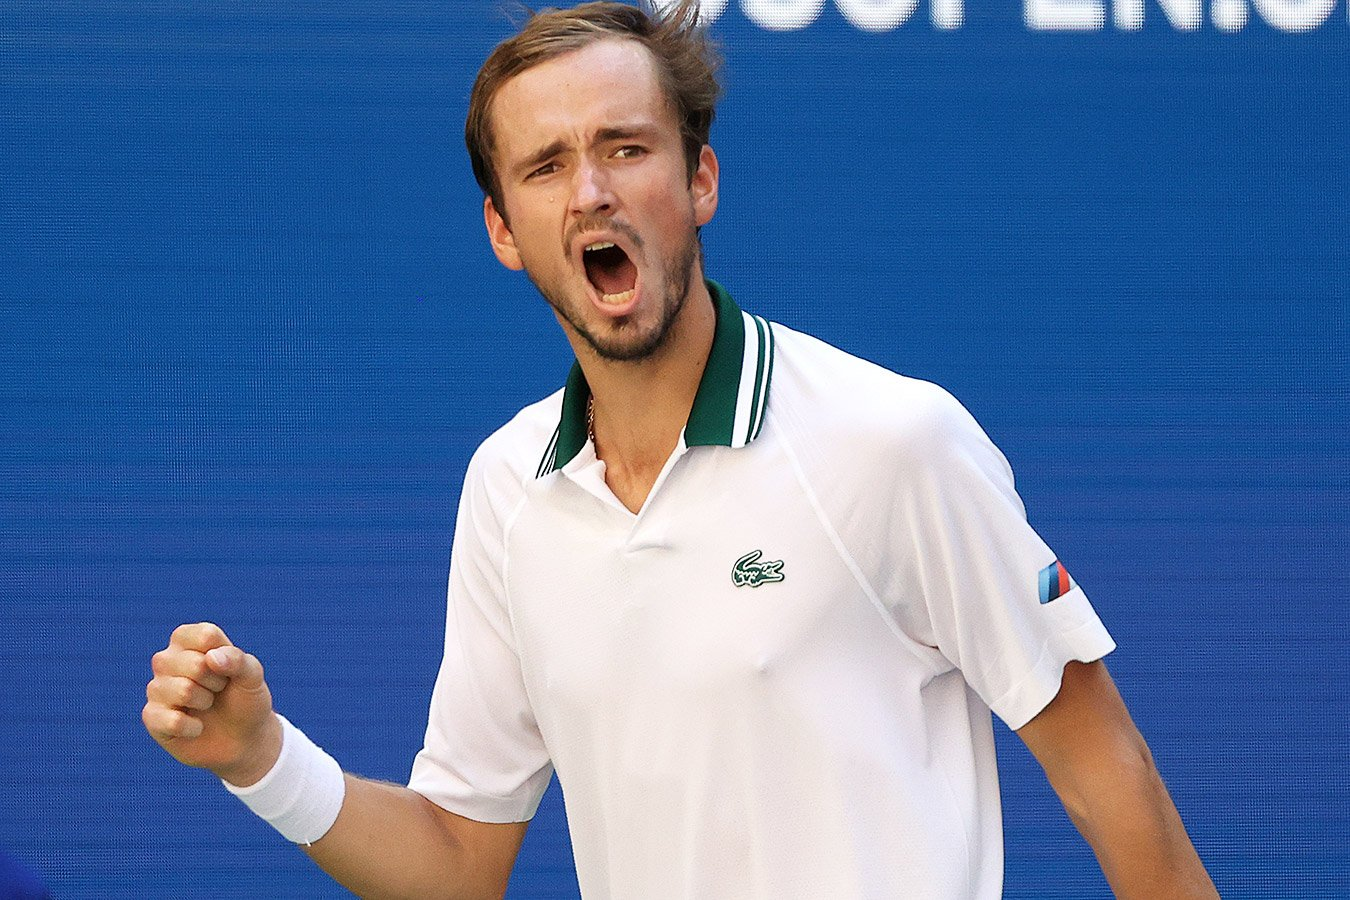 Новак Джокович — Даниил Медведев: прямая трансляция финала US Open на «Матч ТВ»